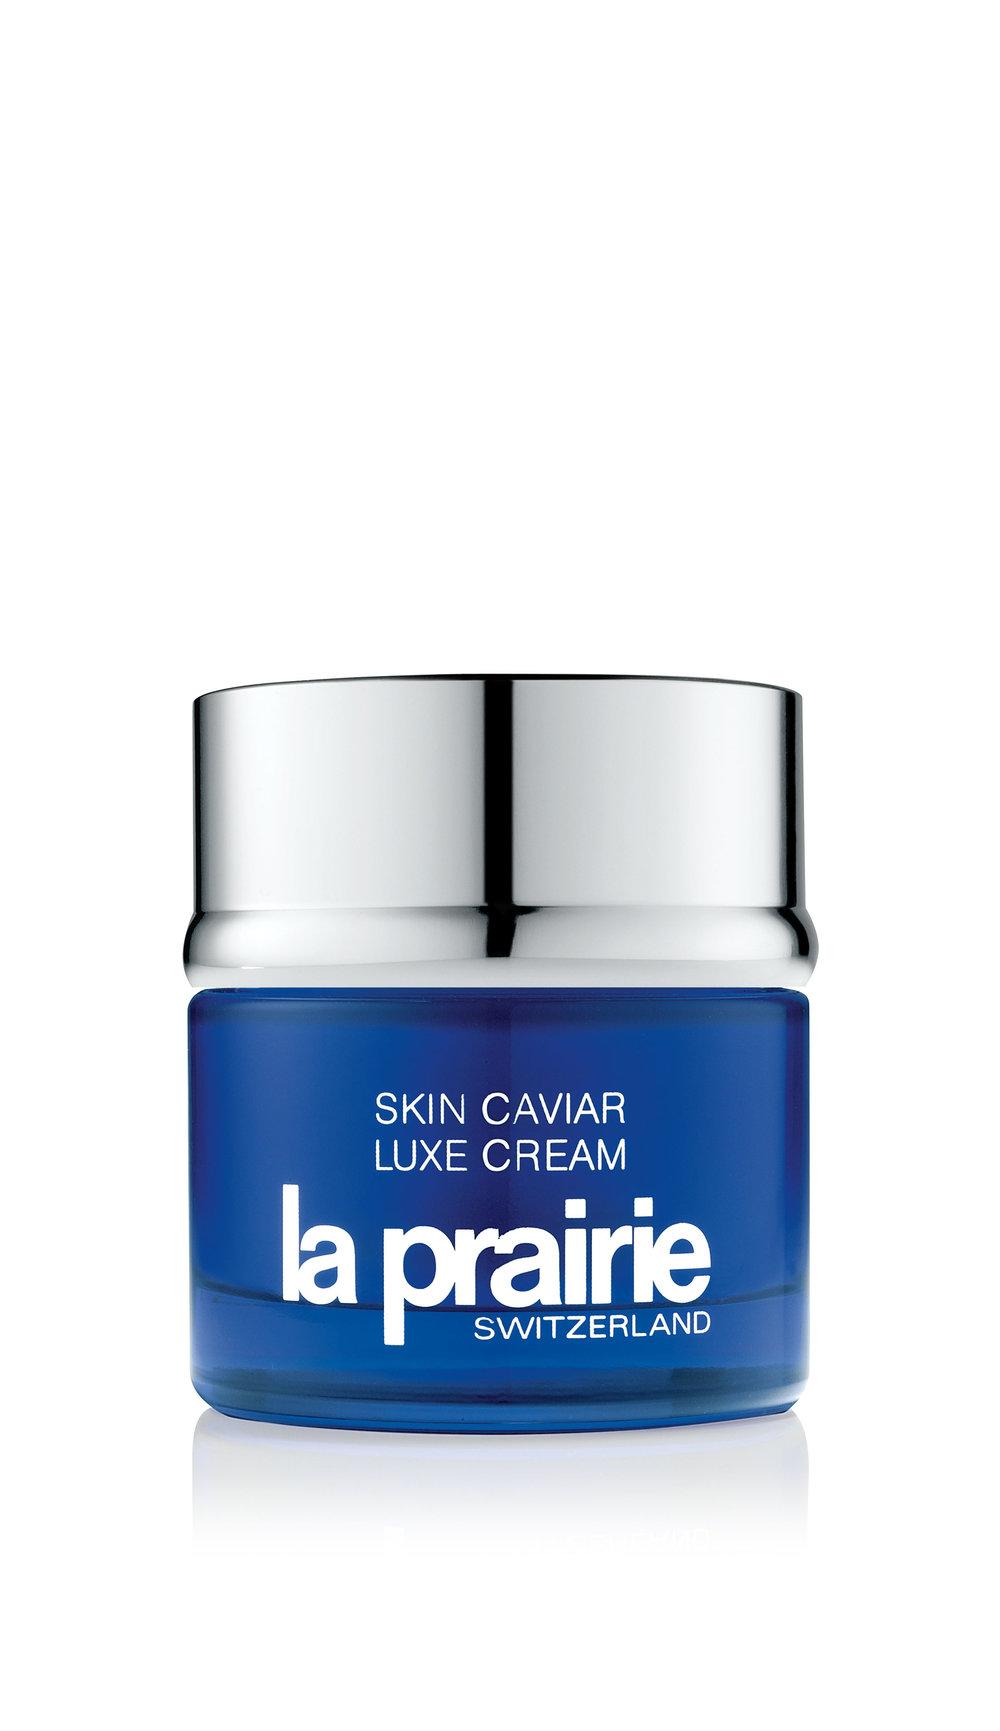 Skin Caviar Luxe Cream 2016.jpg